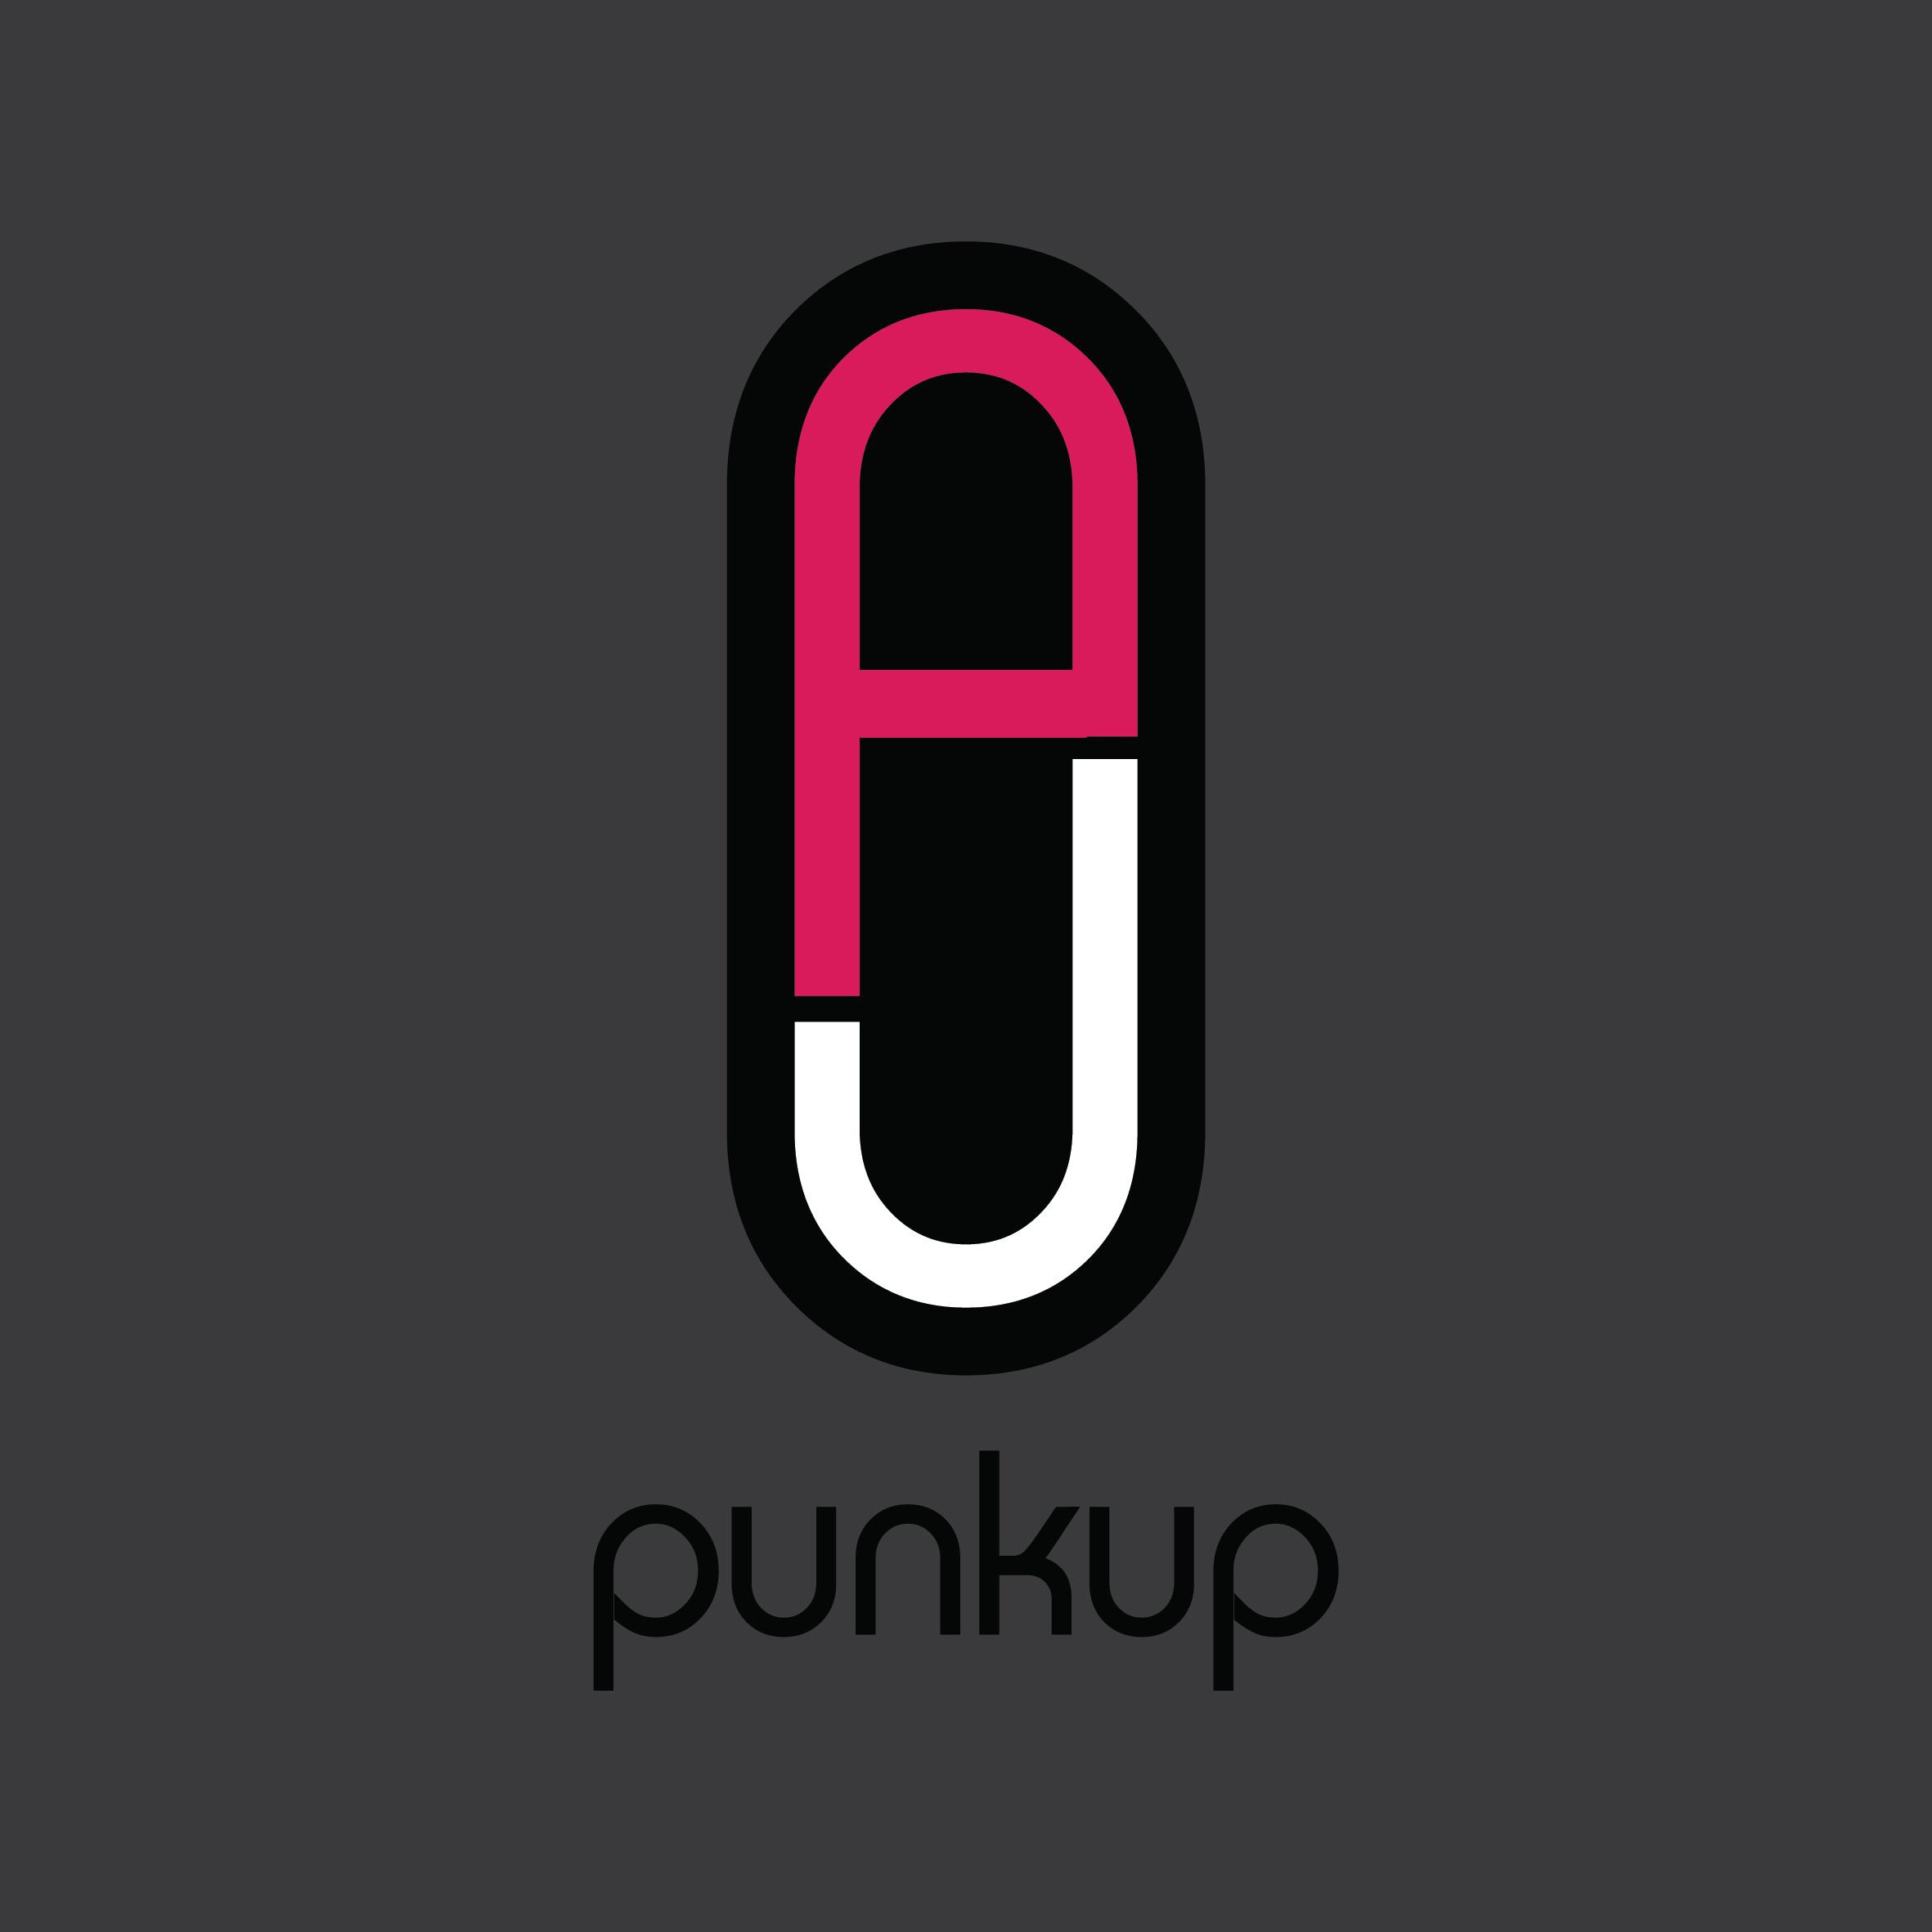 punkup